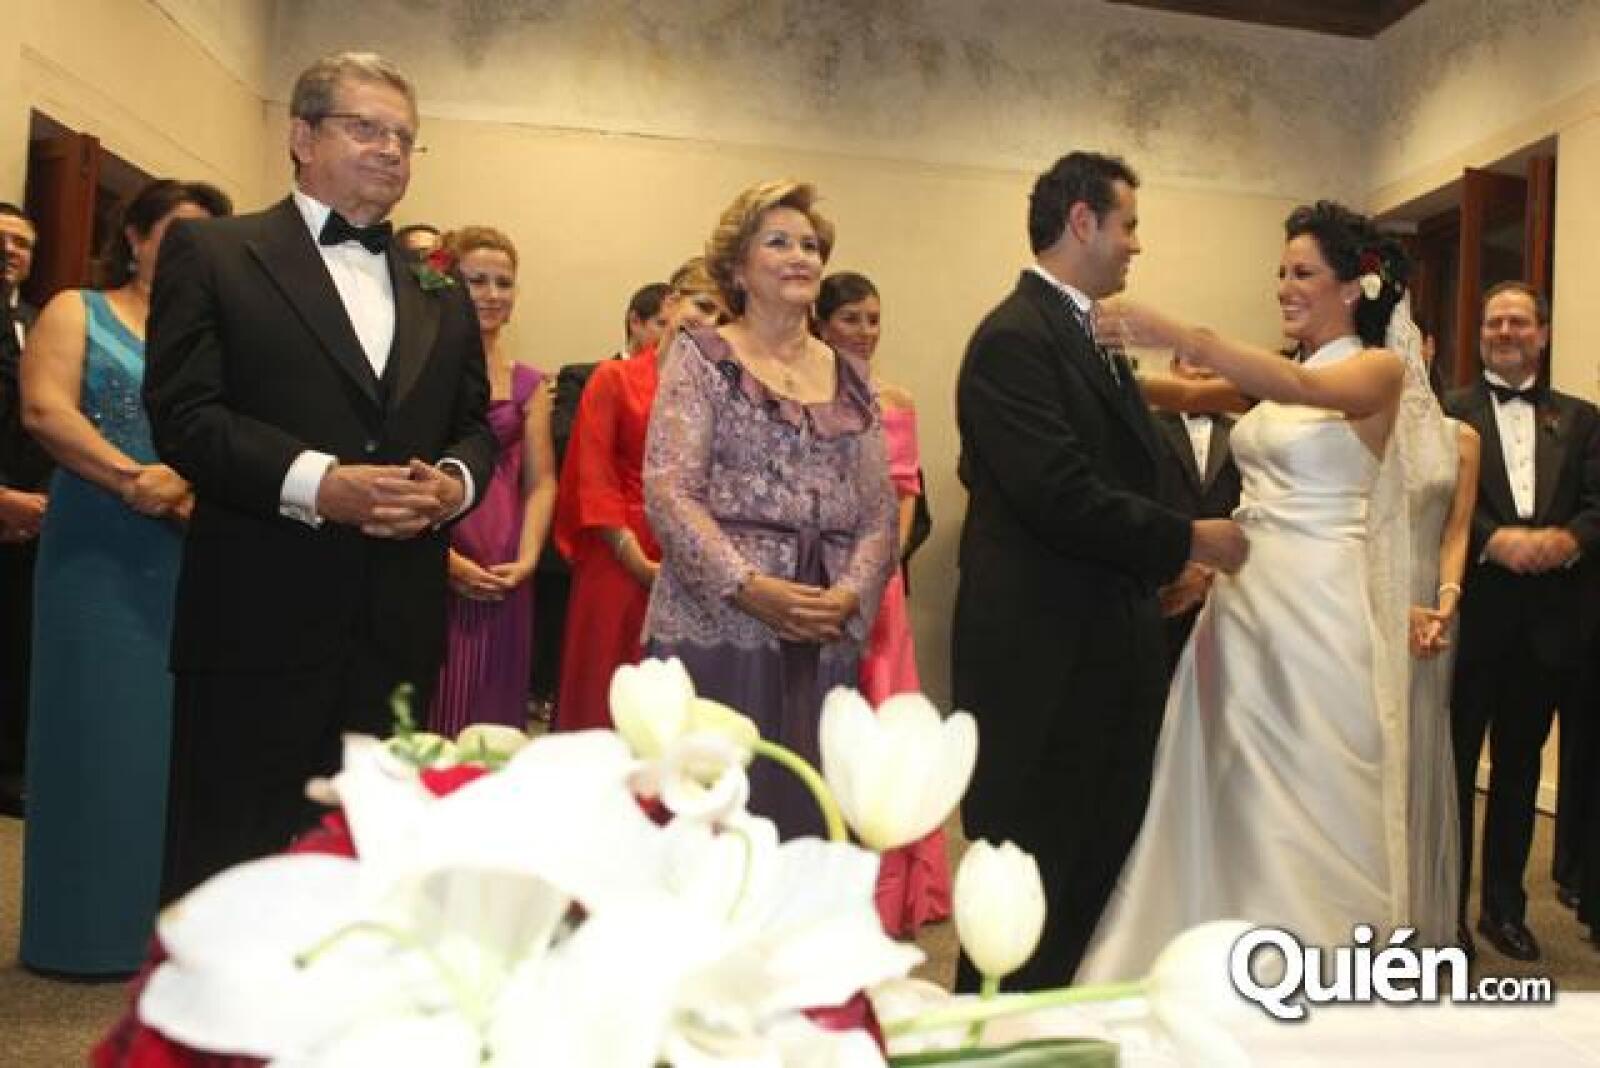 Guillermo Ochoa,Ana Maria Millan,Guillermo Ochoa y Danielle Dithurbide